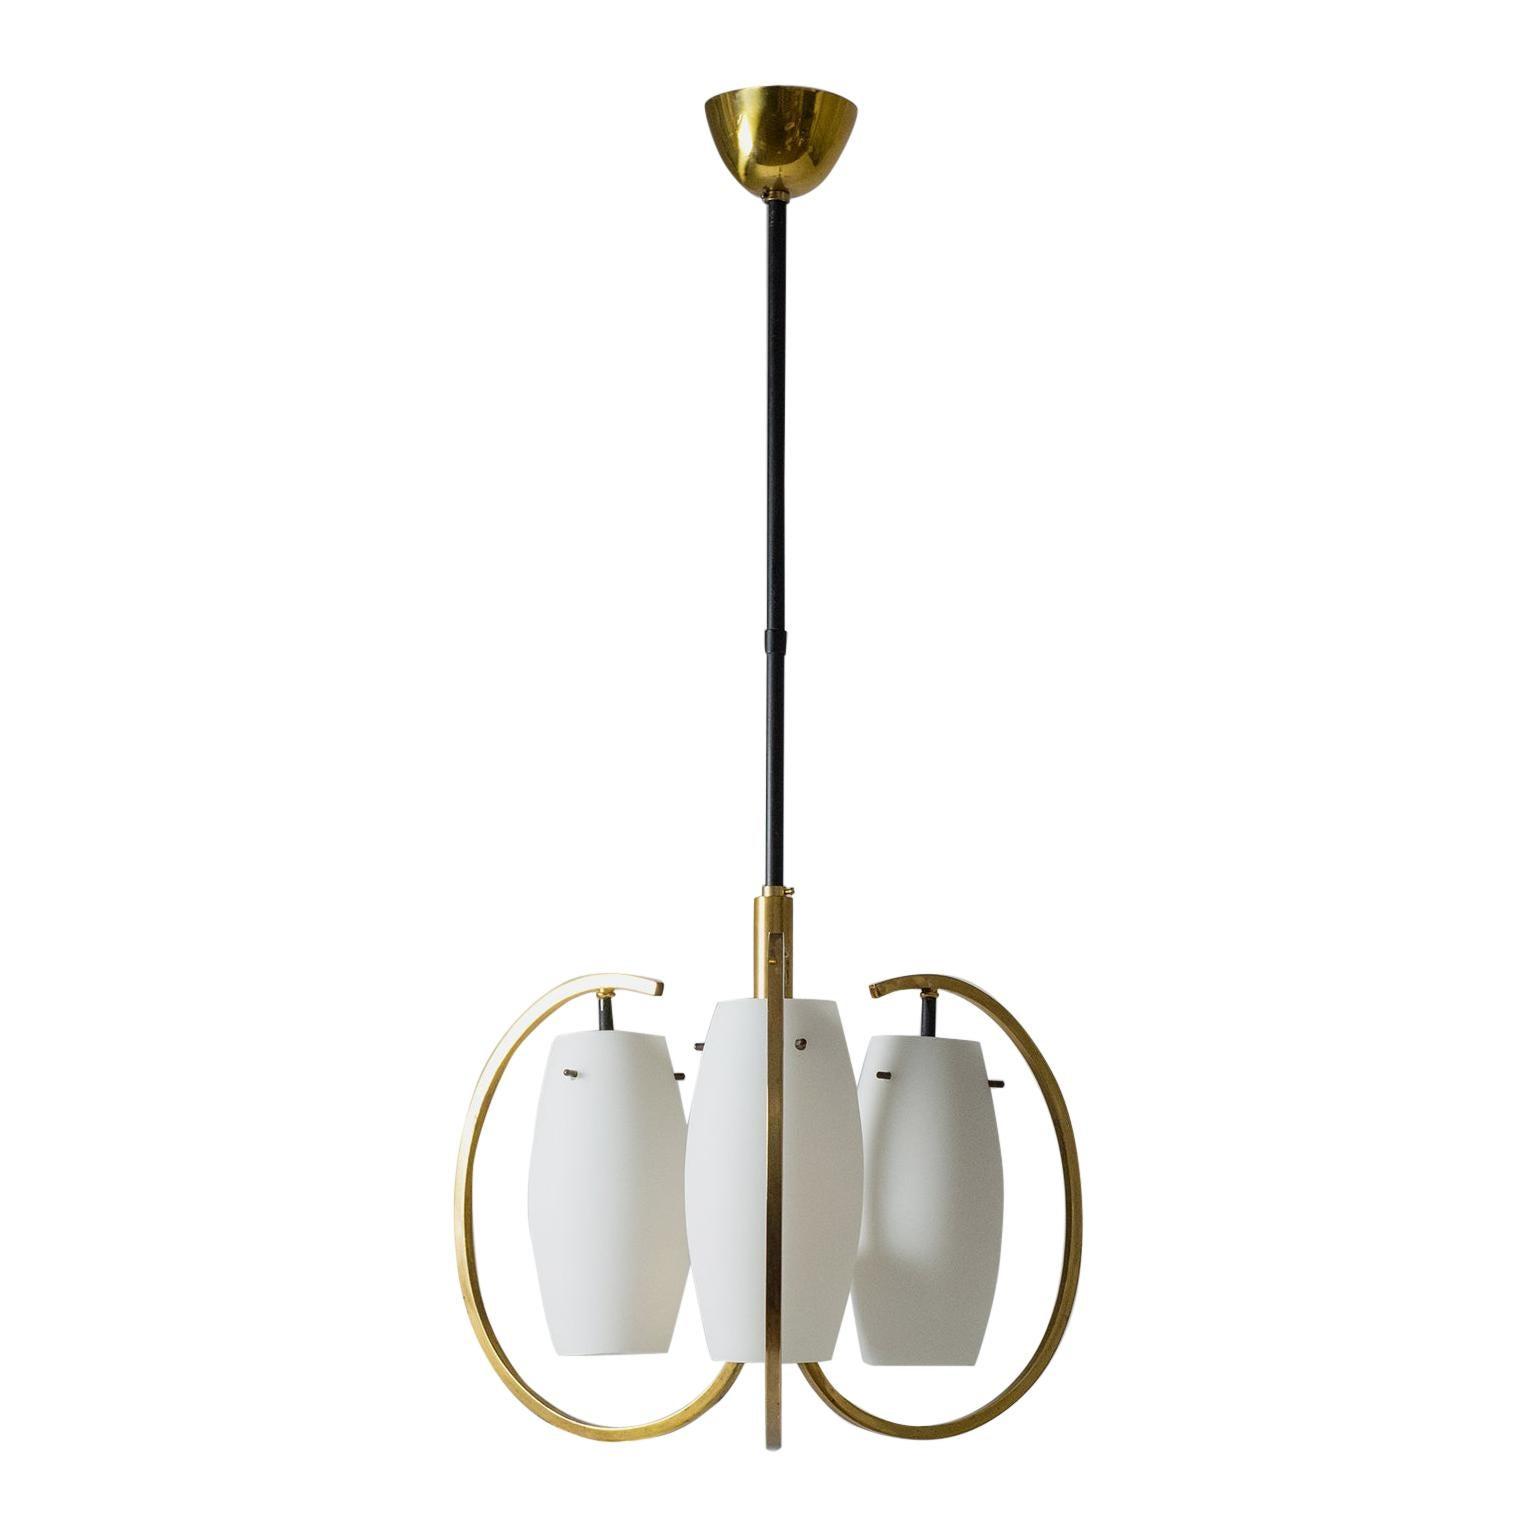 Italian Chandelier, 1950s, Satin Glass and Brass